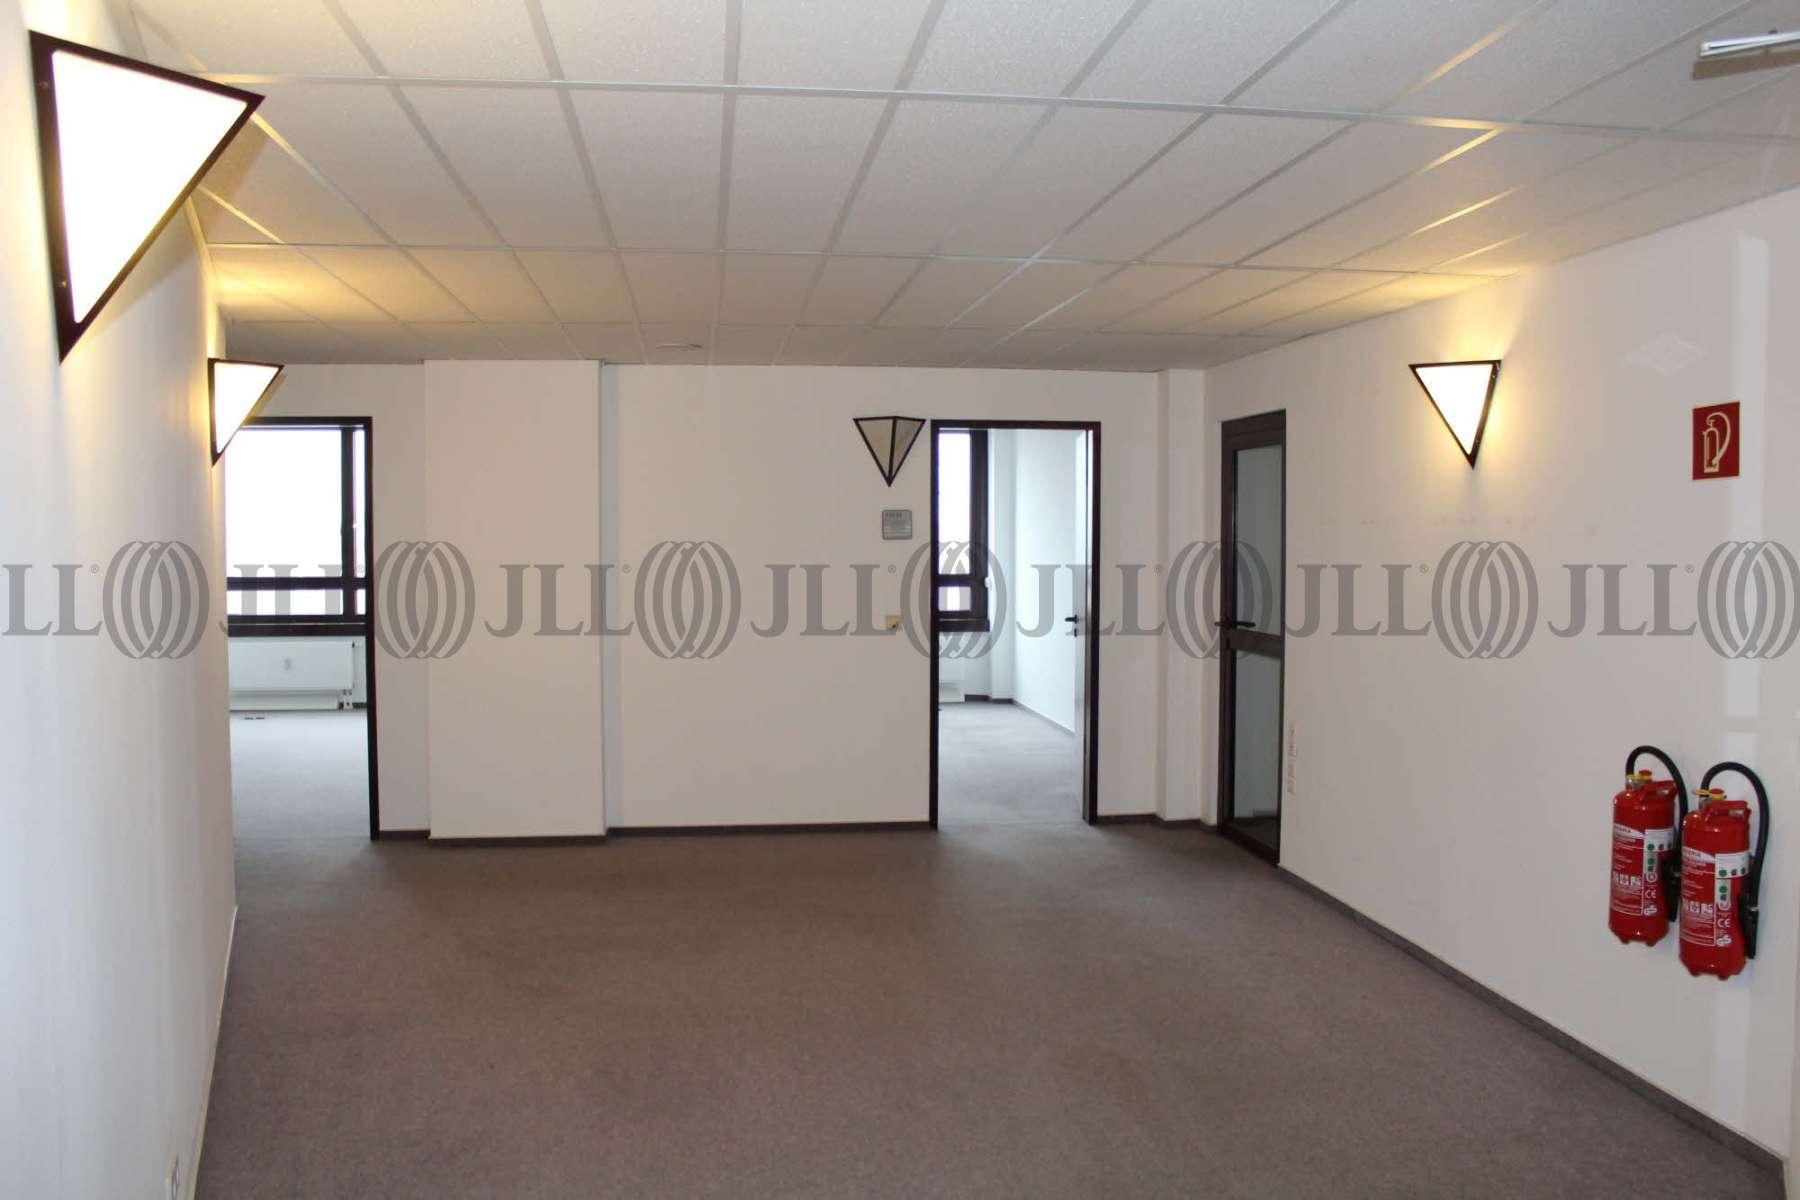 b ro berlin marzahn b0080 zur miete jll. Black Bedroom Furniture Sets. Home Design Ideas